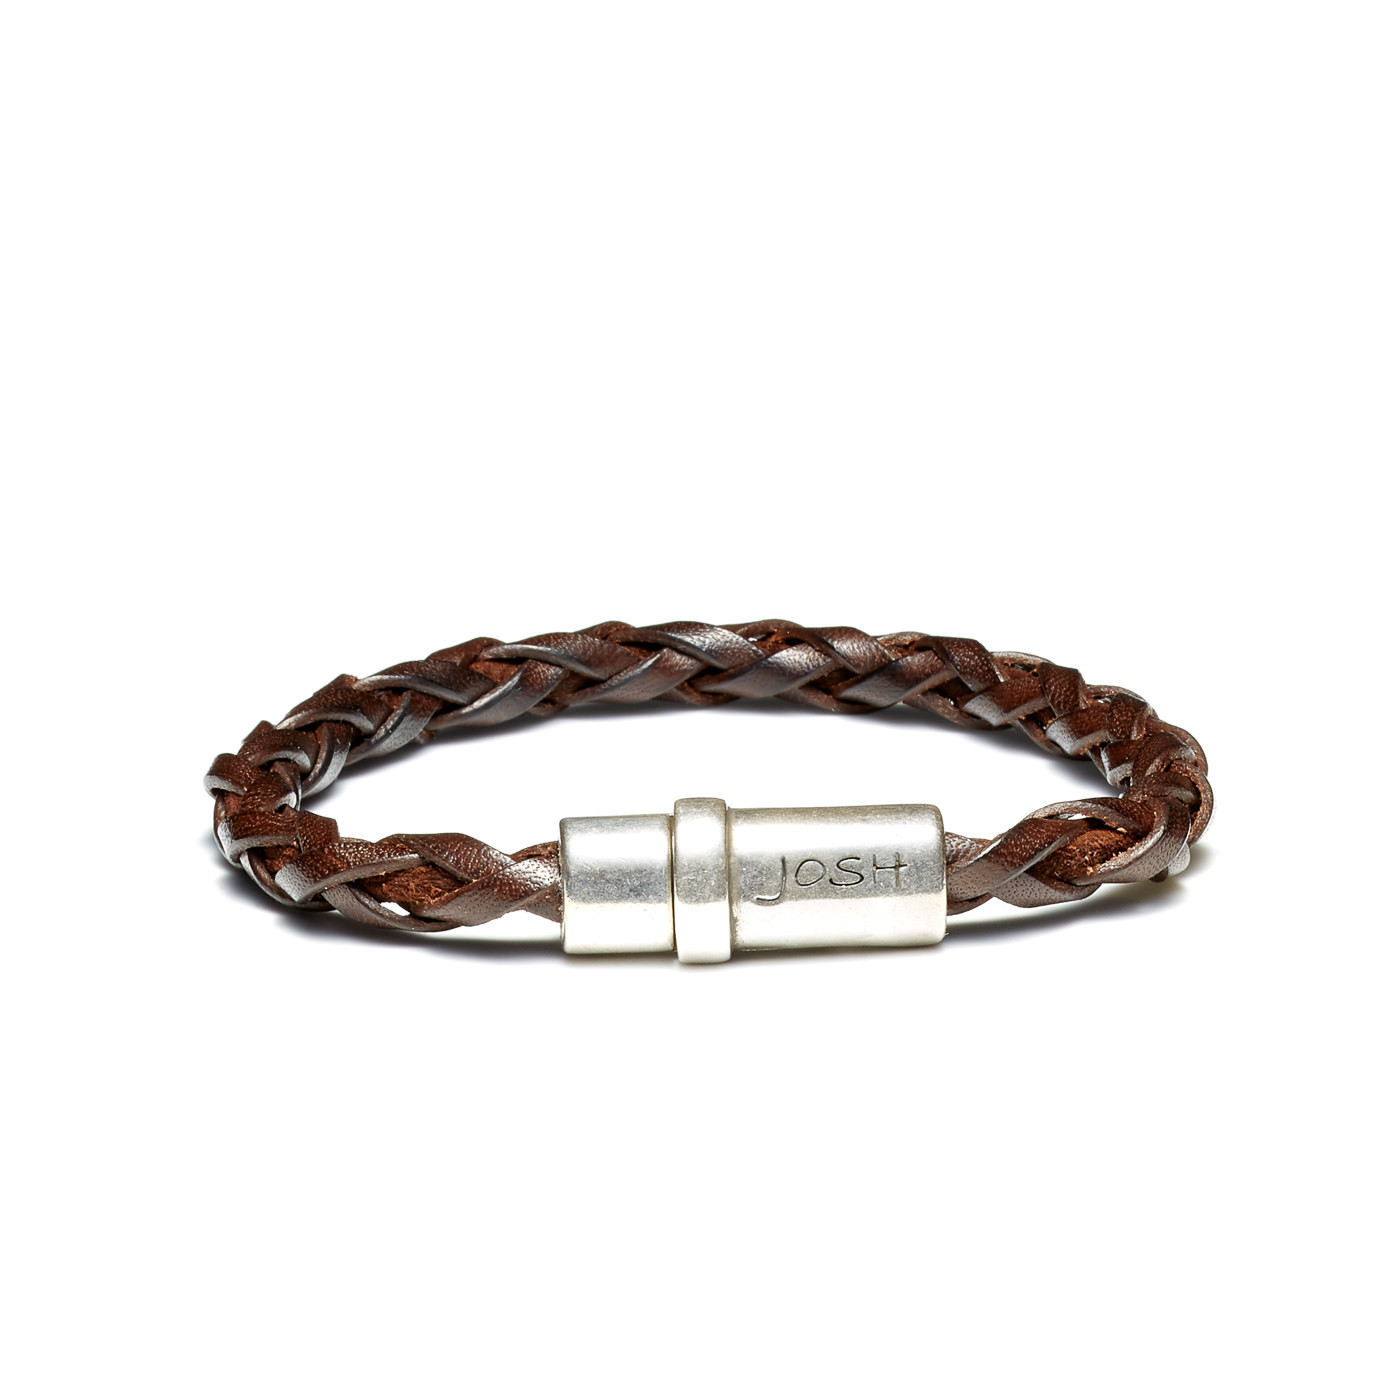 Josh Vintage Brown Armband 09193-BRA-S/BROWN (Lengte: 20.50-22.50 cm)